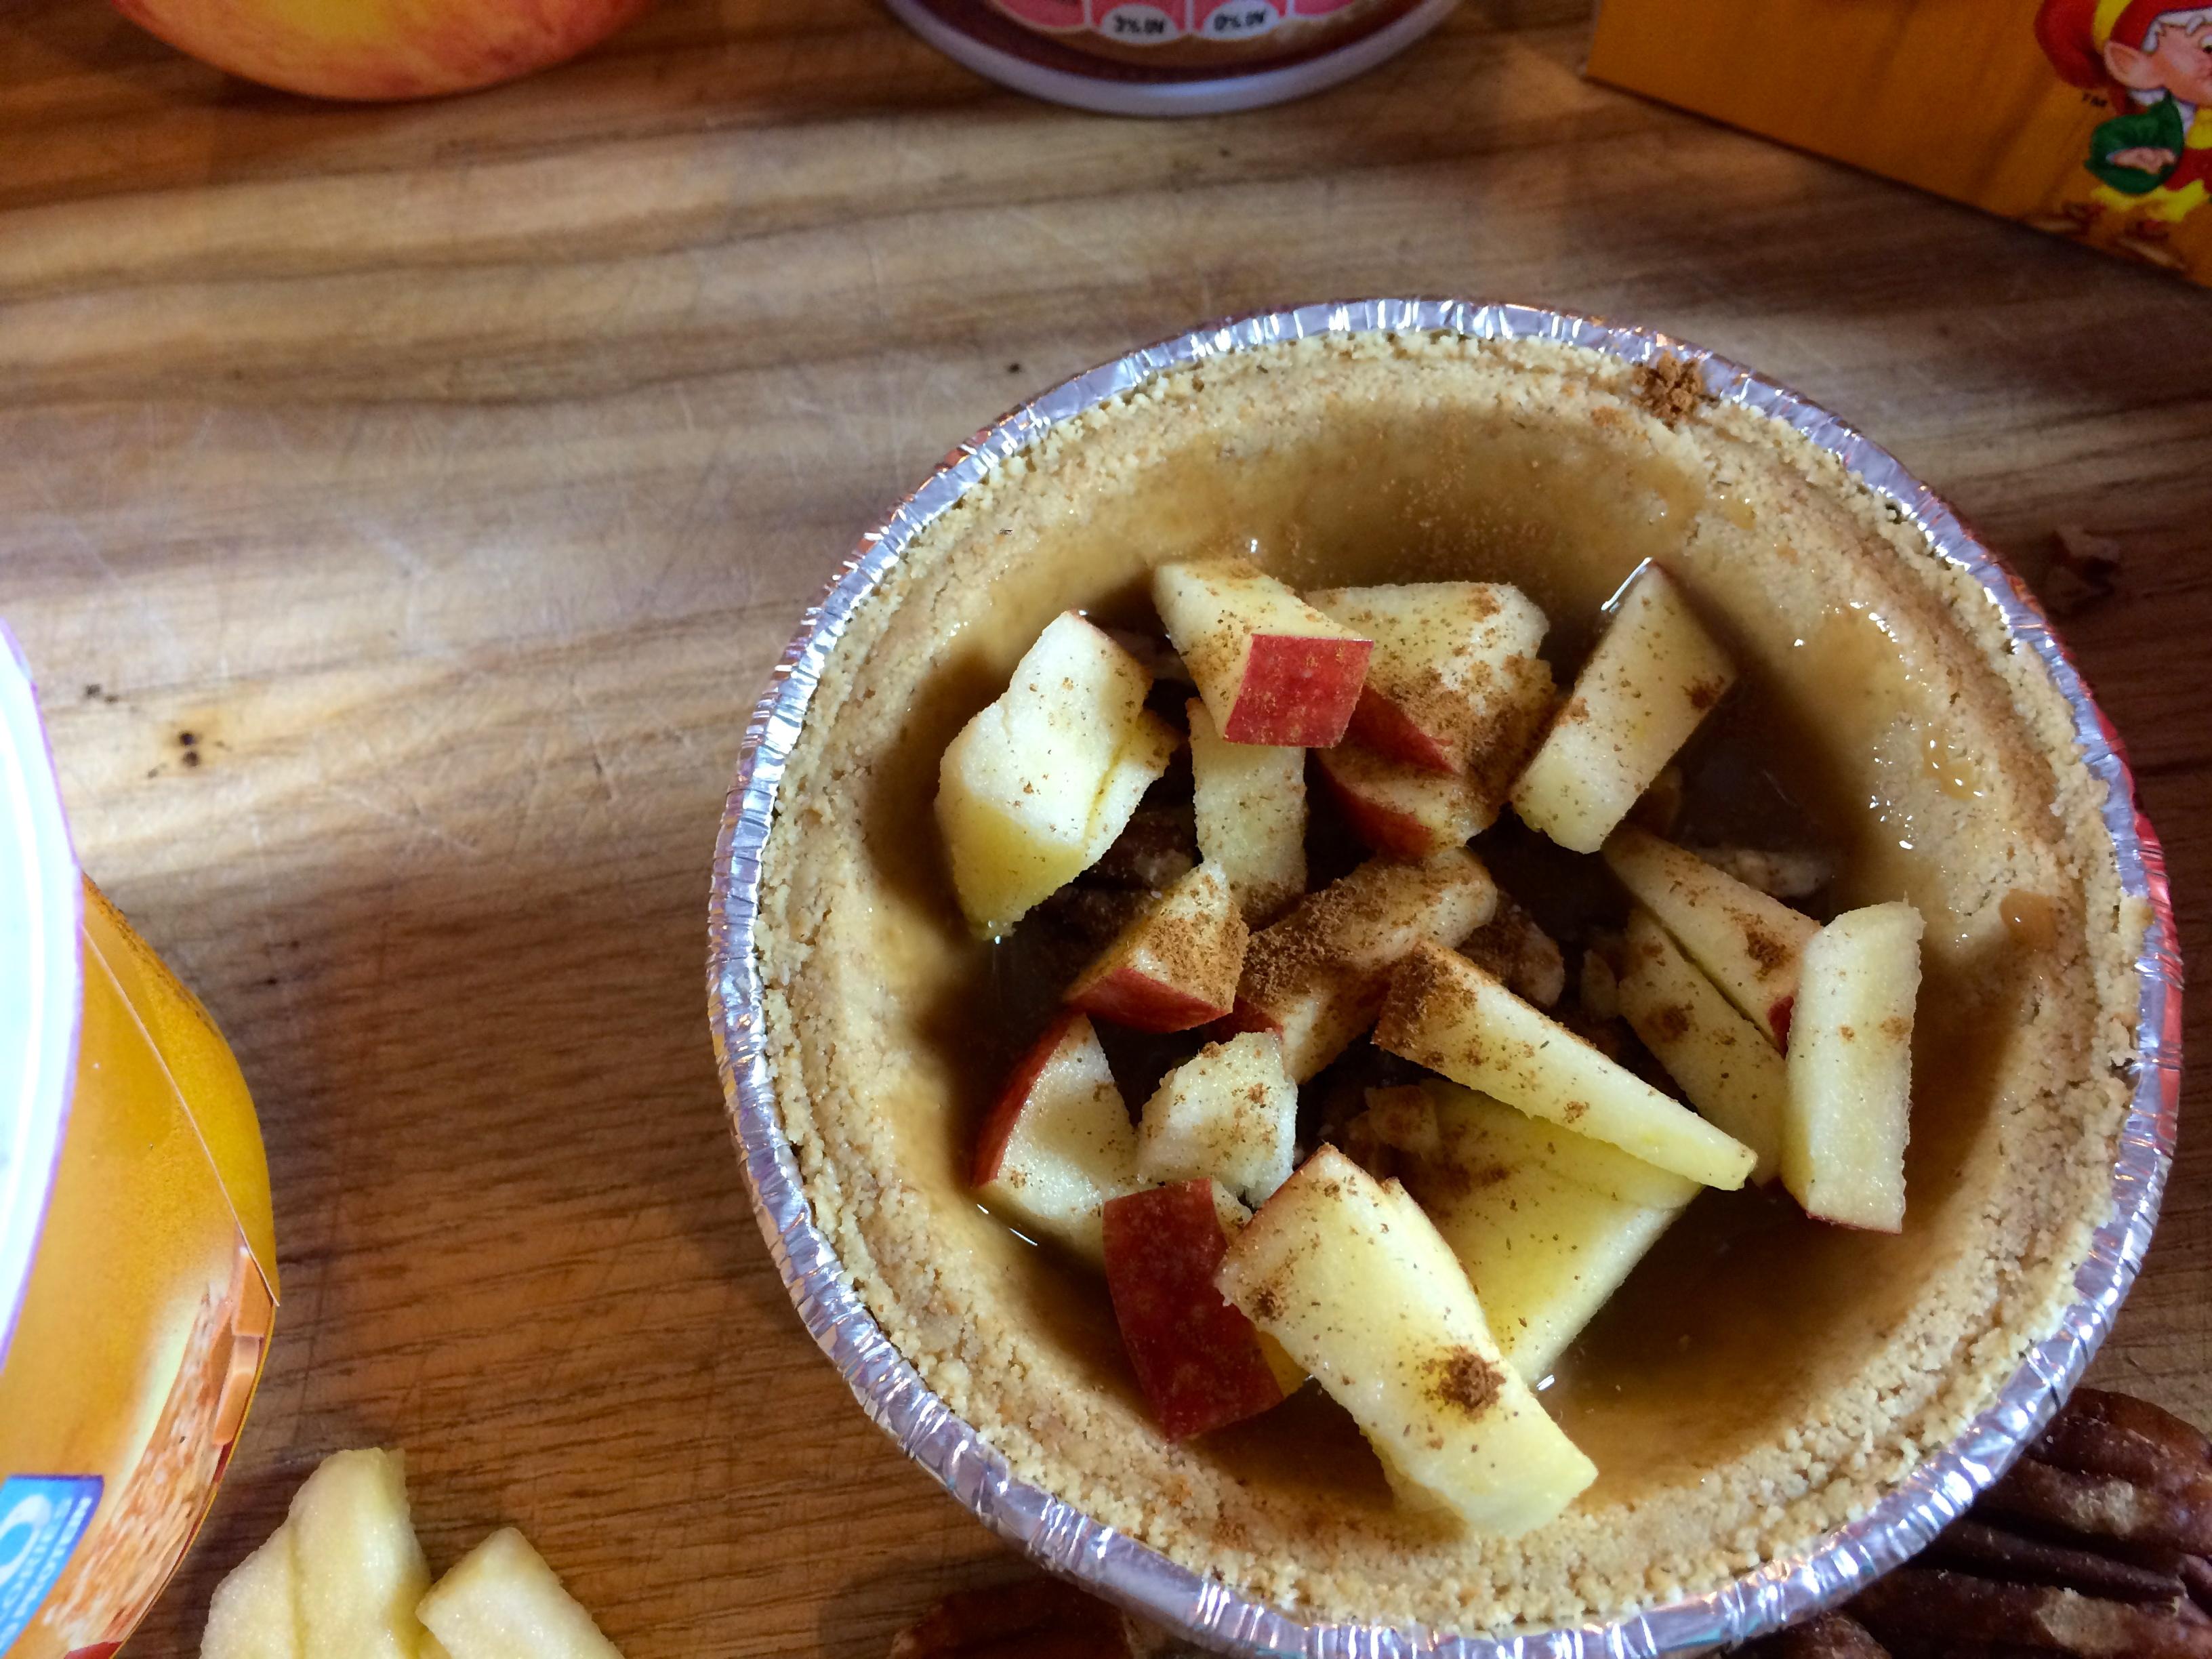 Caramel Apple Anytime Greek Yougurt Pie #EffortlessPies